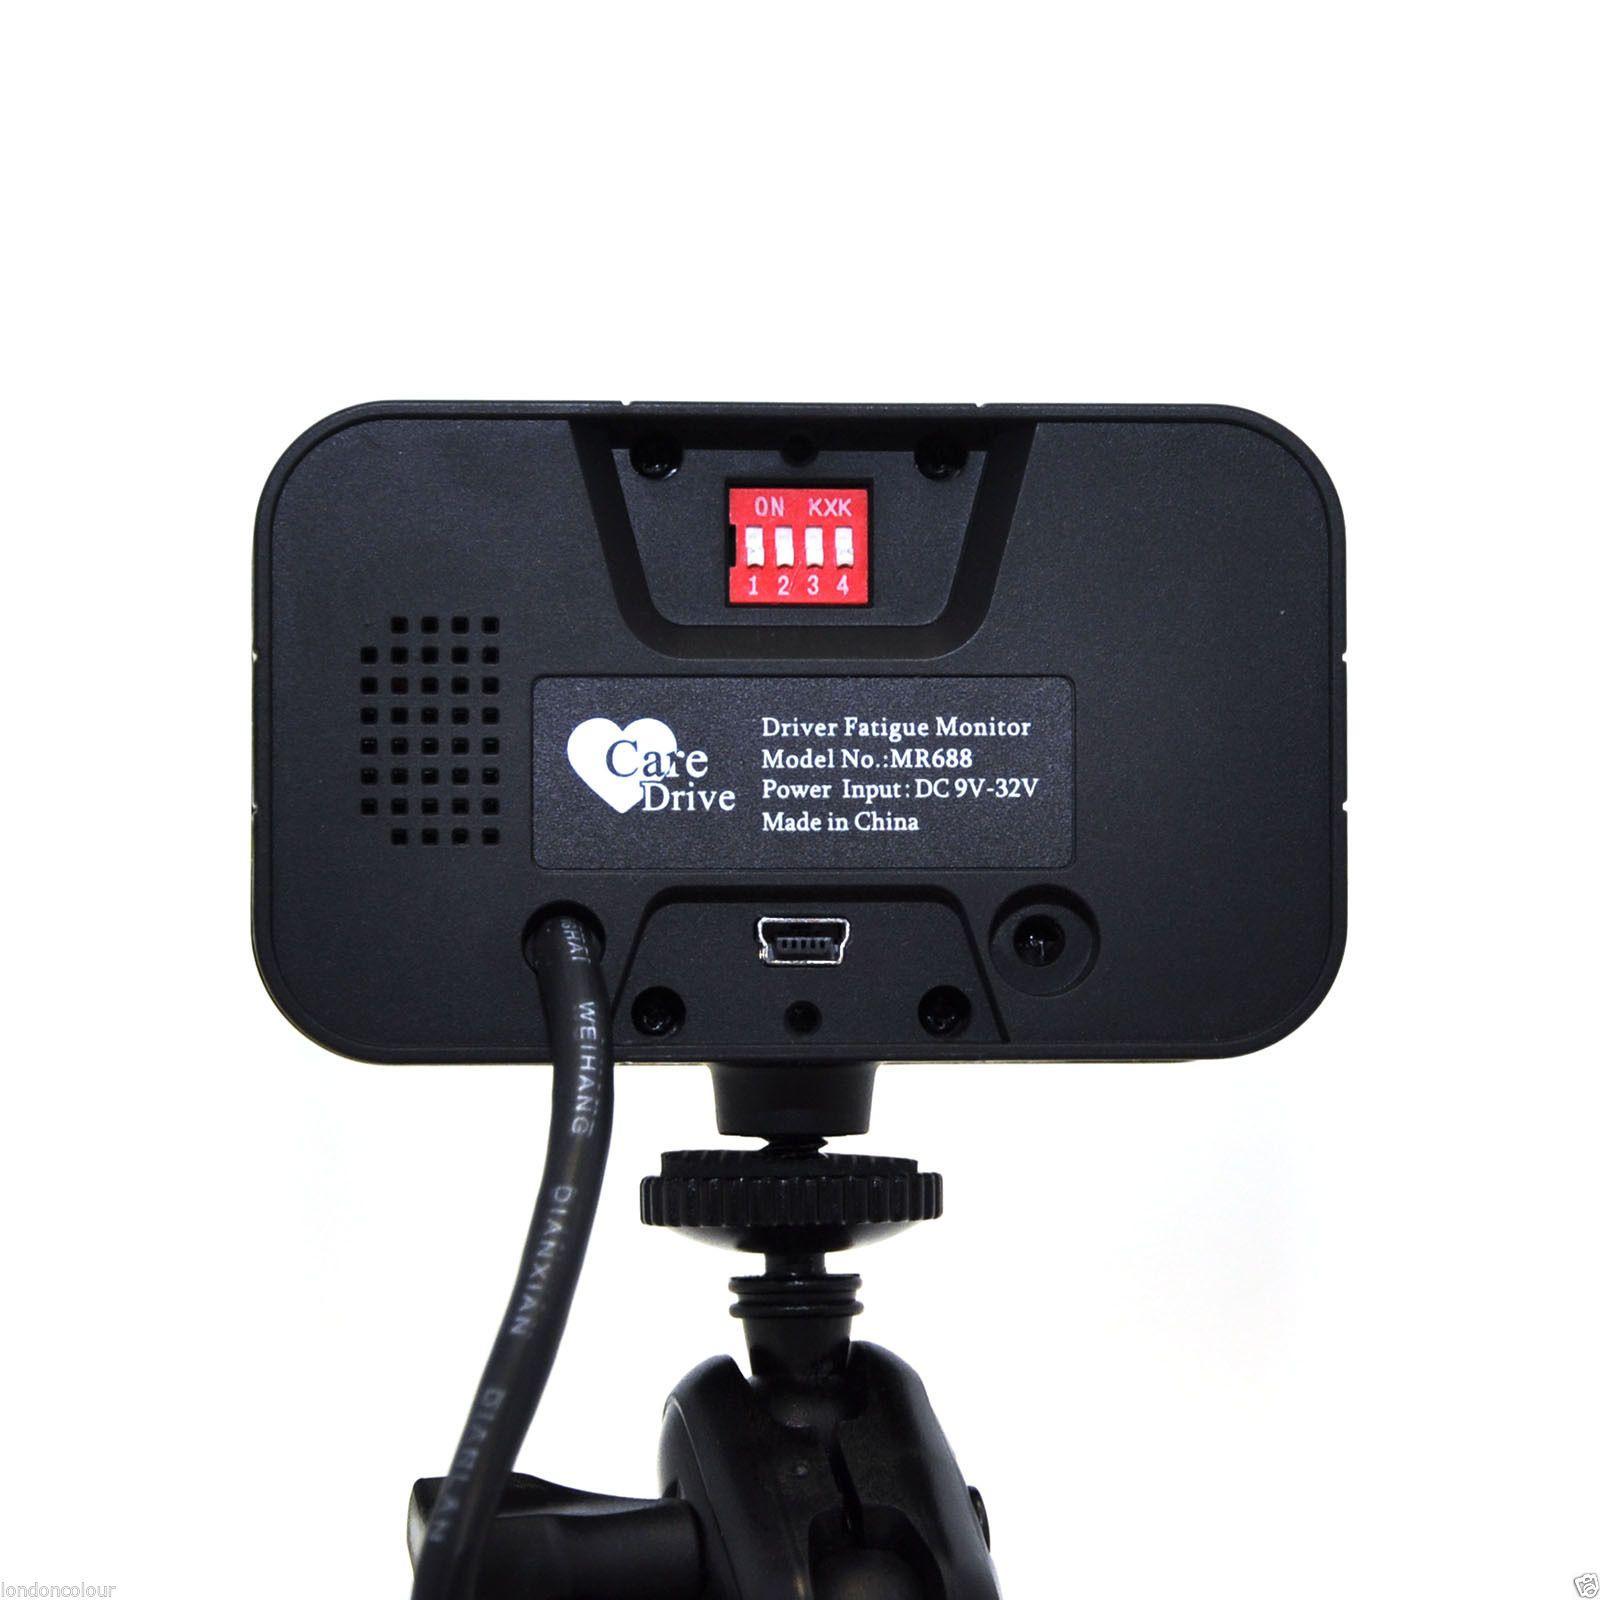 Driver Fatigue System Civil Standard Version built-in GPS